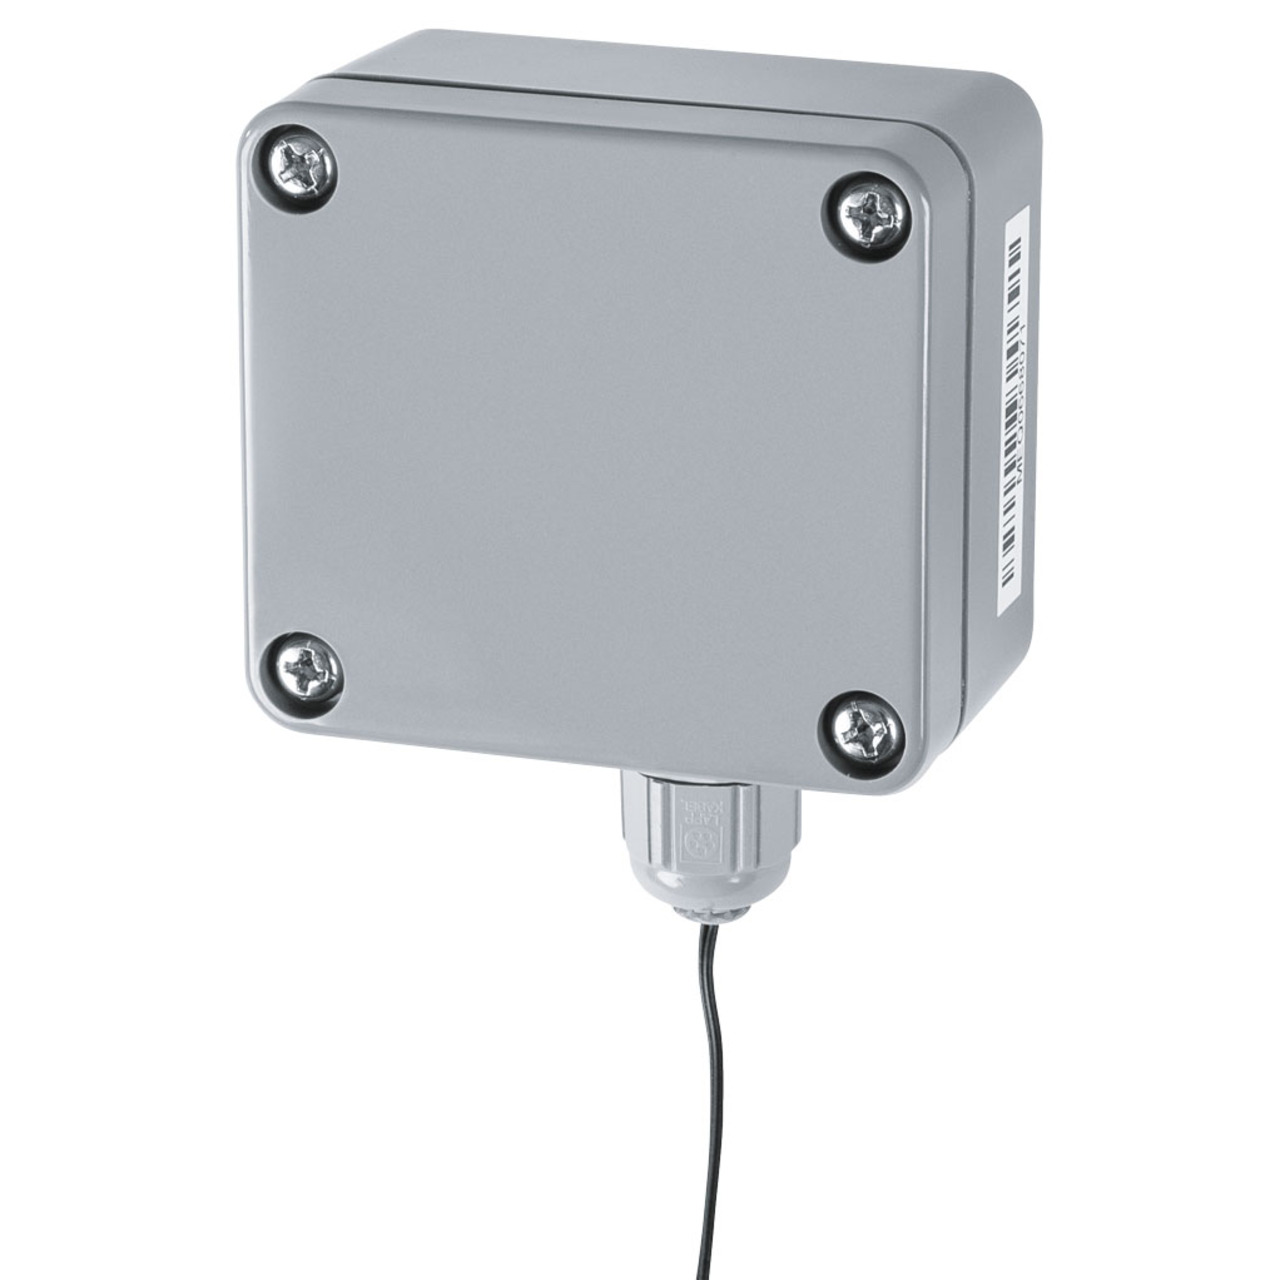 Homematic Funk-Temperatursensor HM-WDS30-TO- aussen für Smart Home / Hausautomation